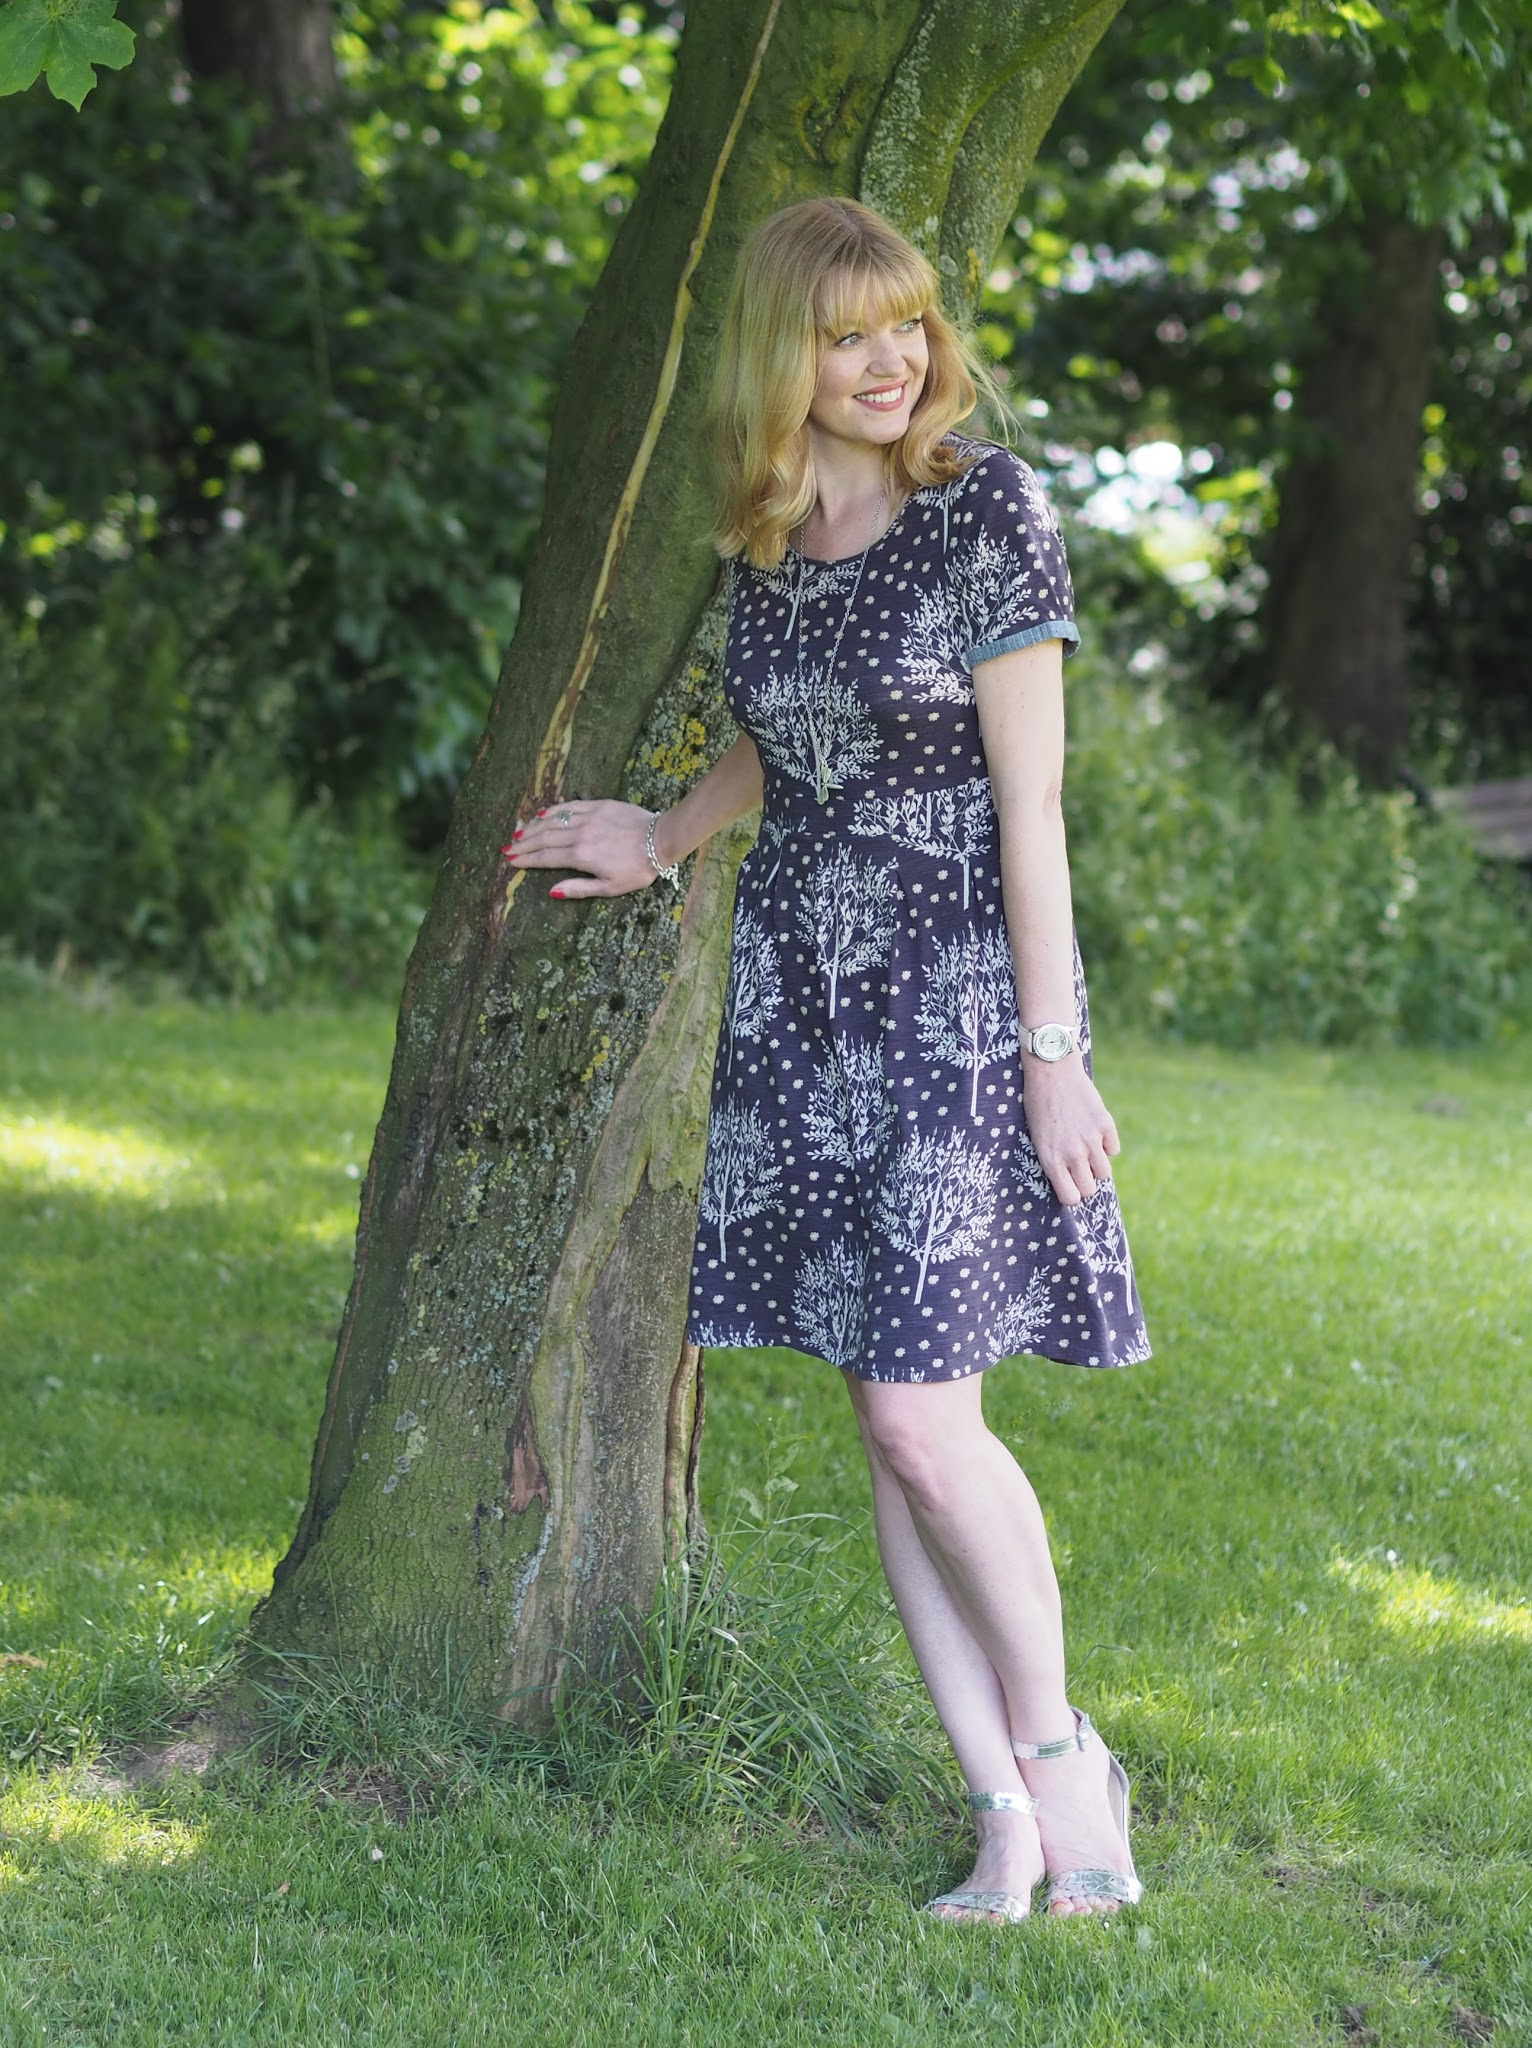 Braintree eco-fashion purple floral dress